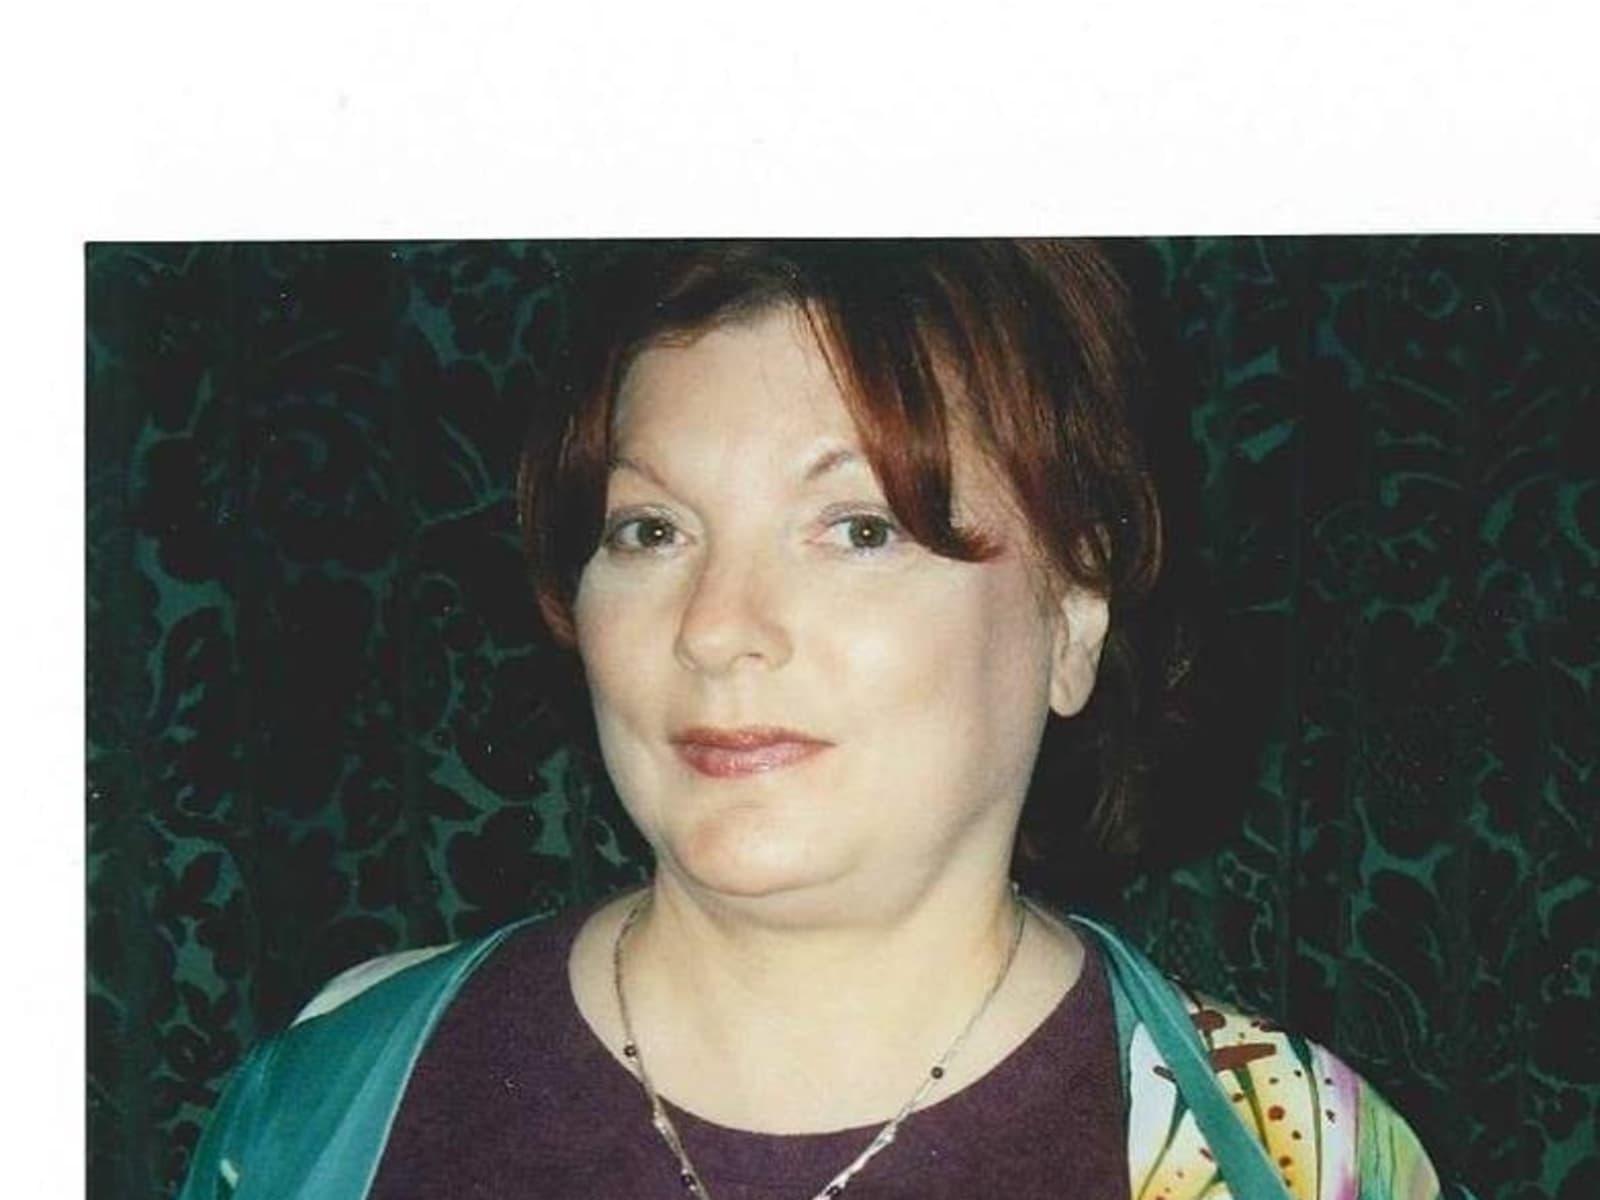 Carol from Philadelphia, Pennsylvania, United States